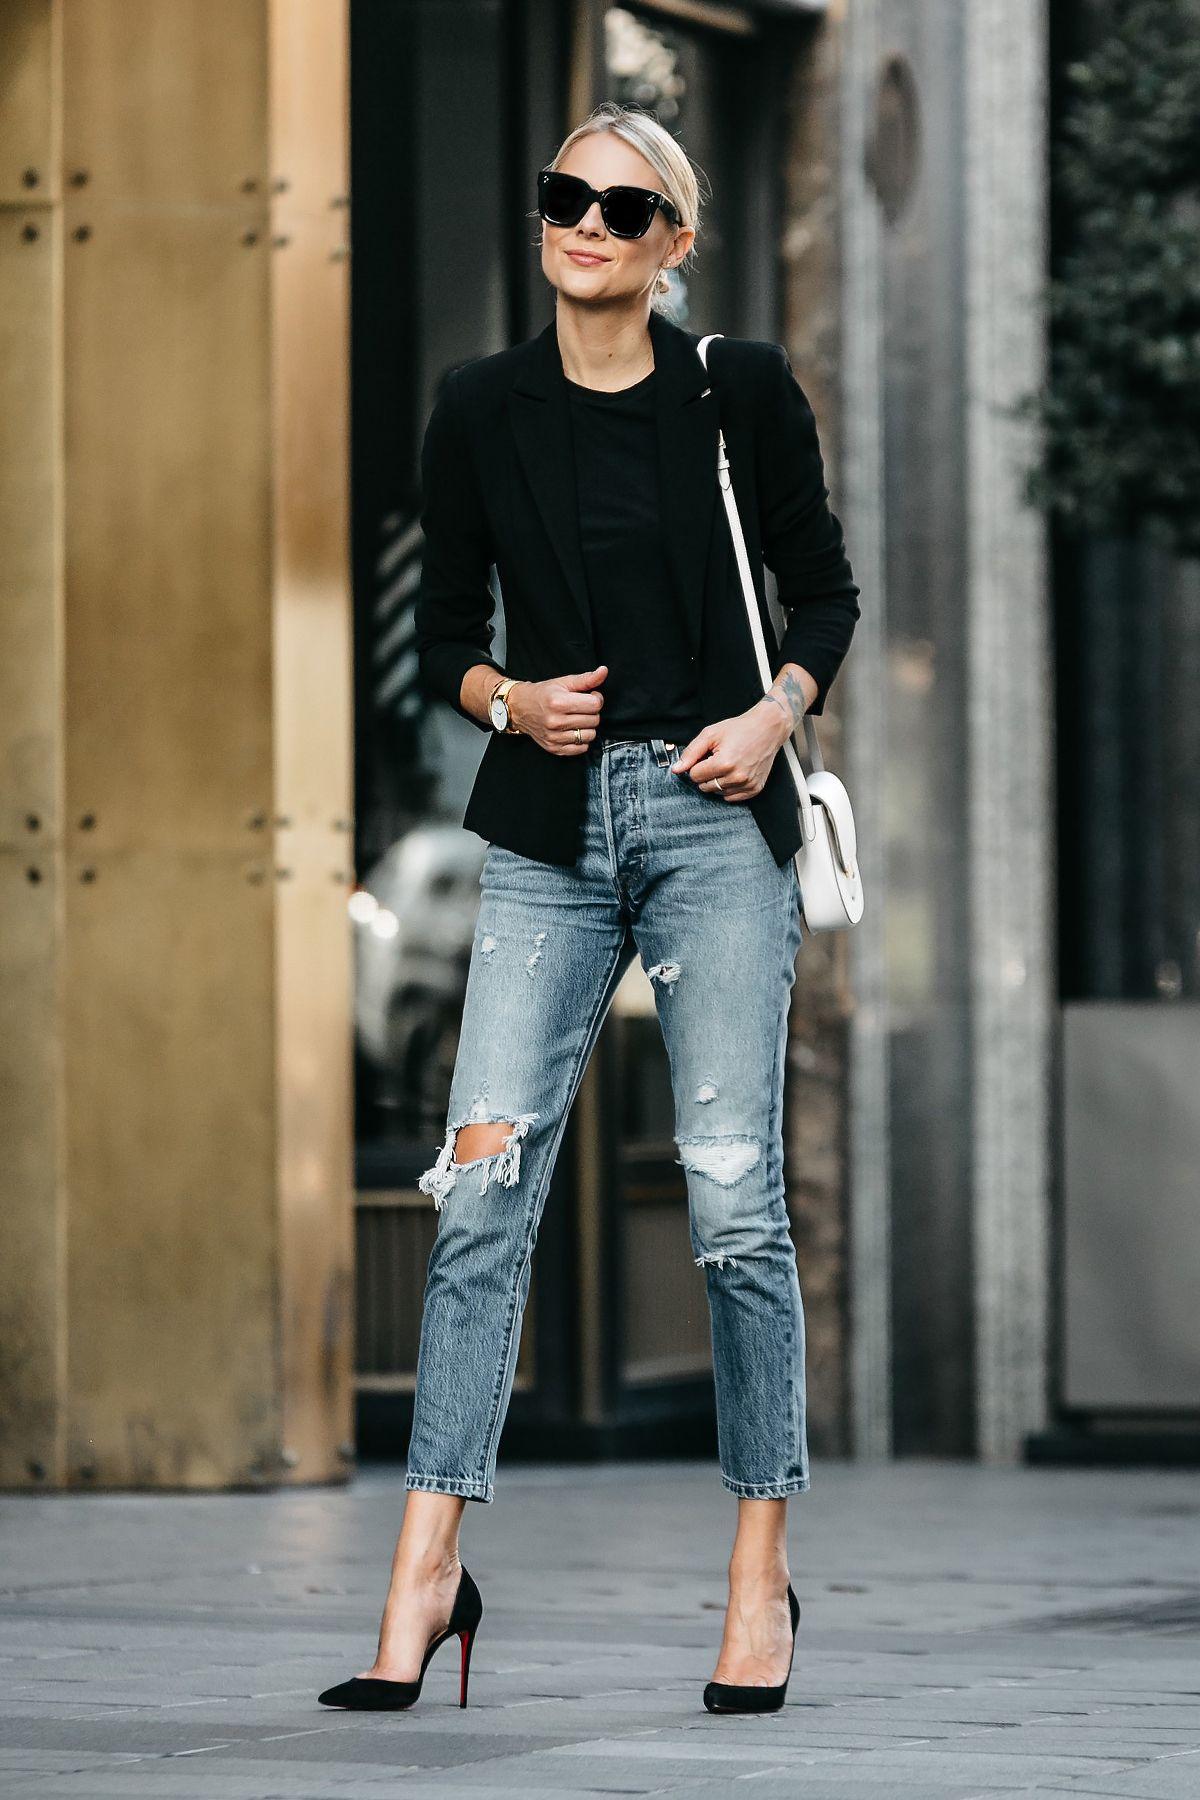 4baf9c1a4bf Favorite way to wear ripped jeans ---- Black Blazer Black Tshirt Denim  Ripped Jeans Outfit Christian Louboutin Black Pumps Celine Trotteur White  Handbag ...